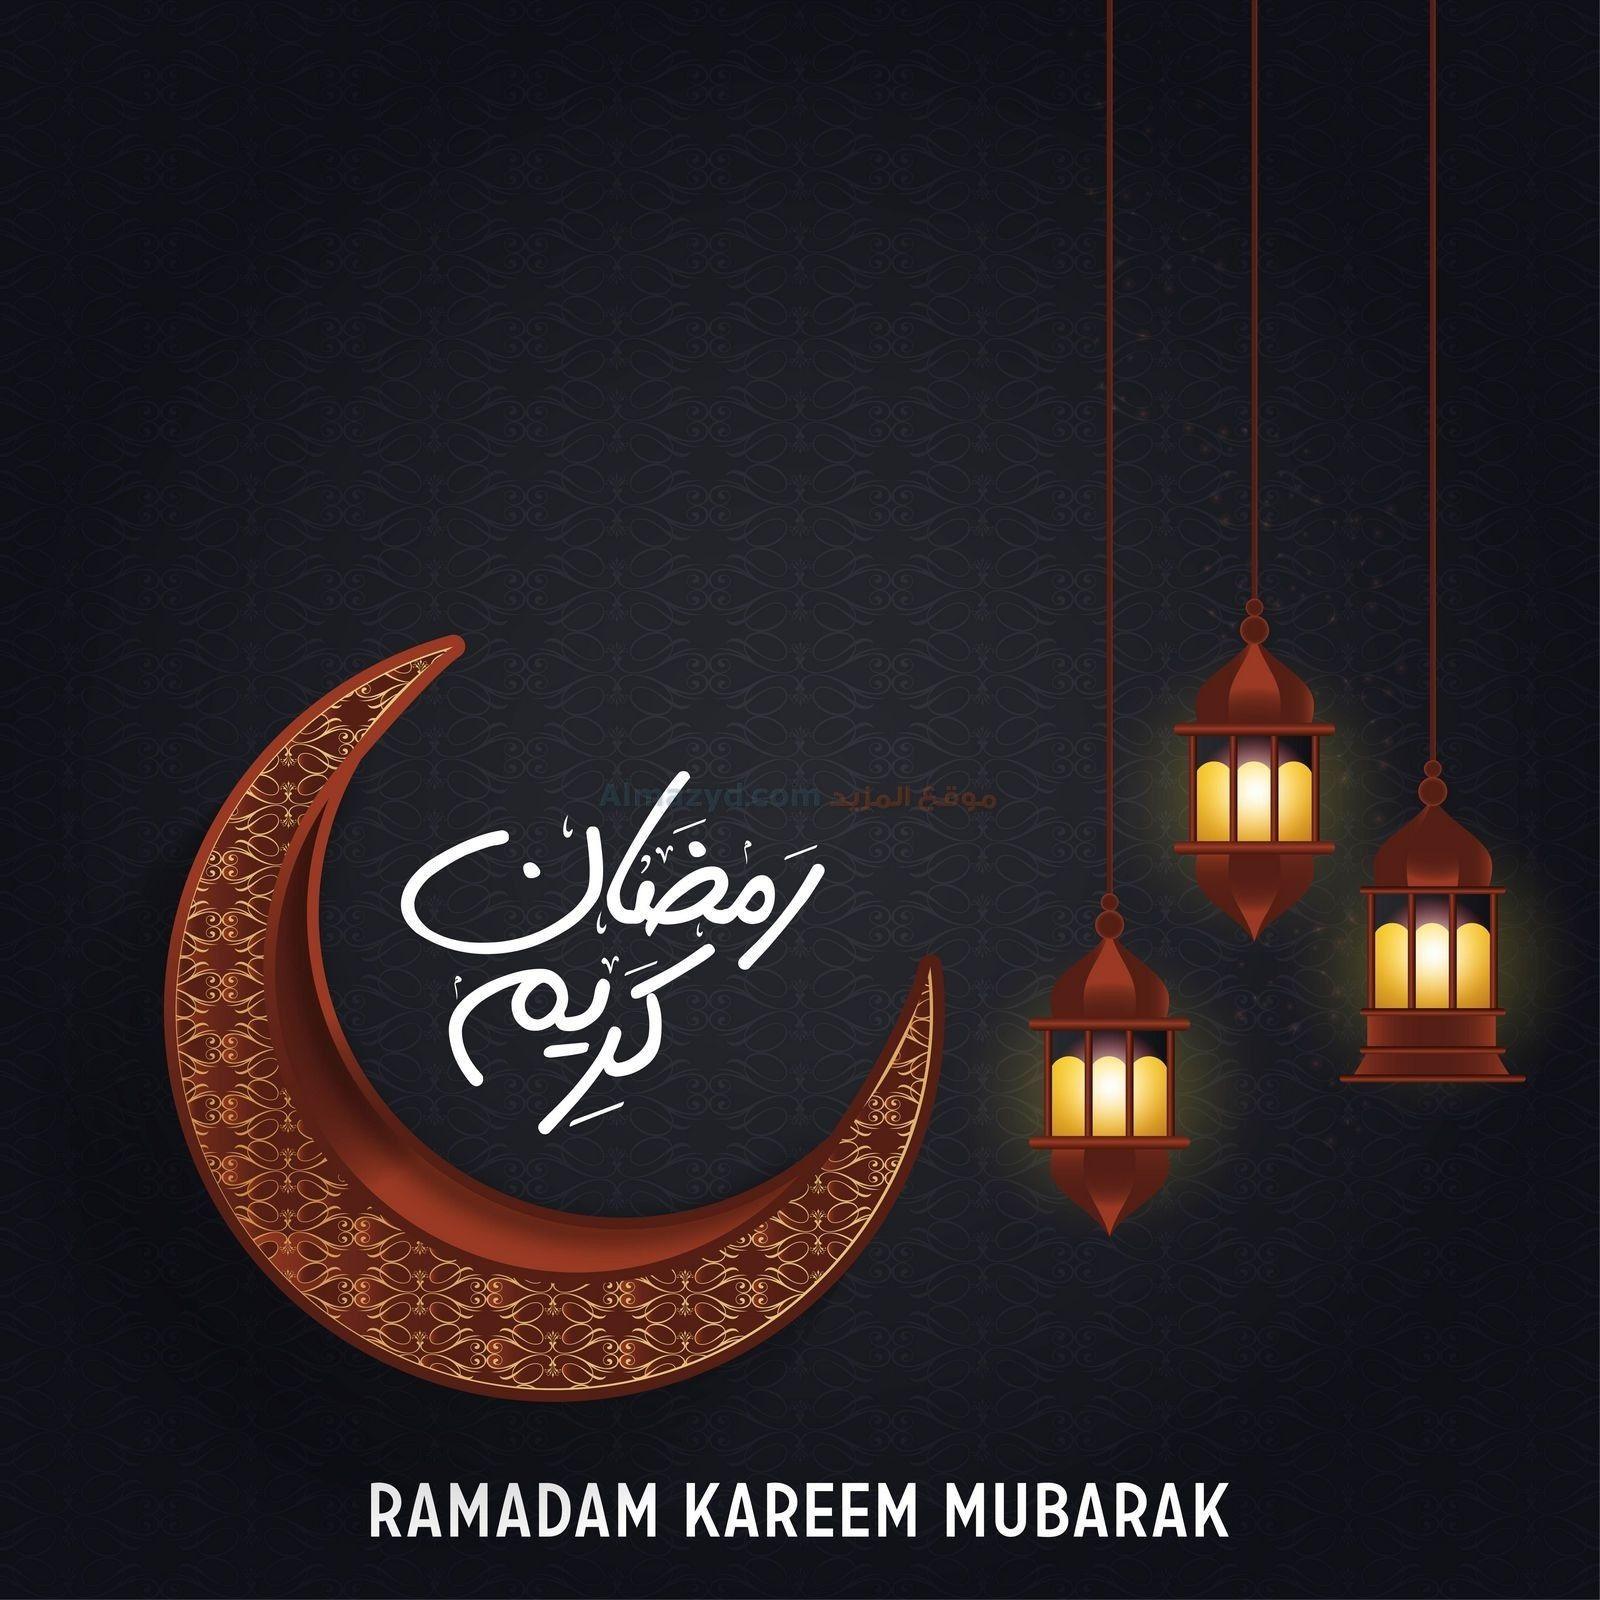 متى رمضان 2021